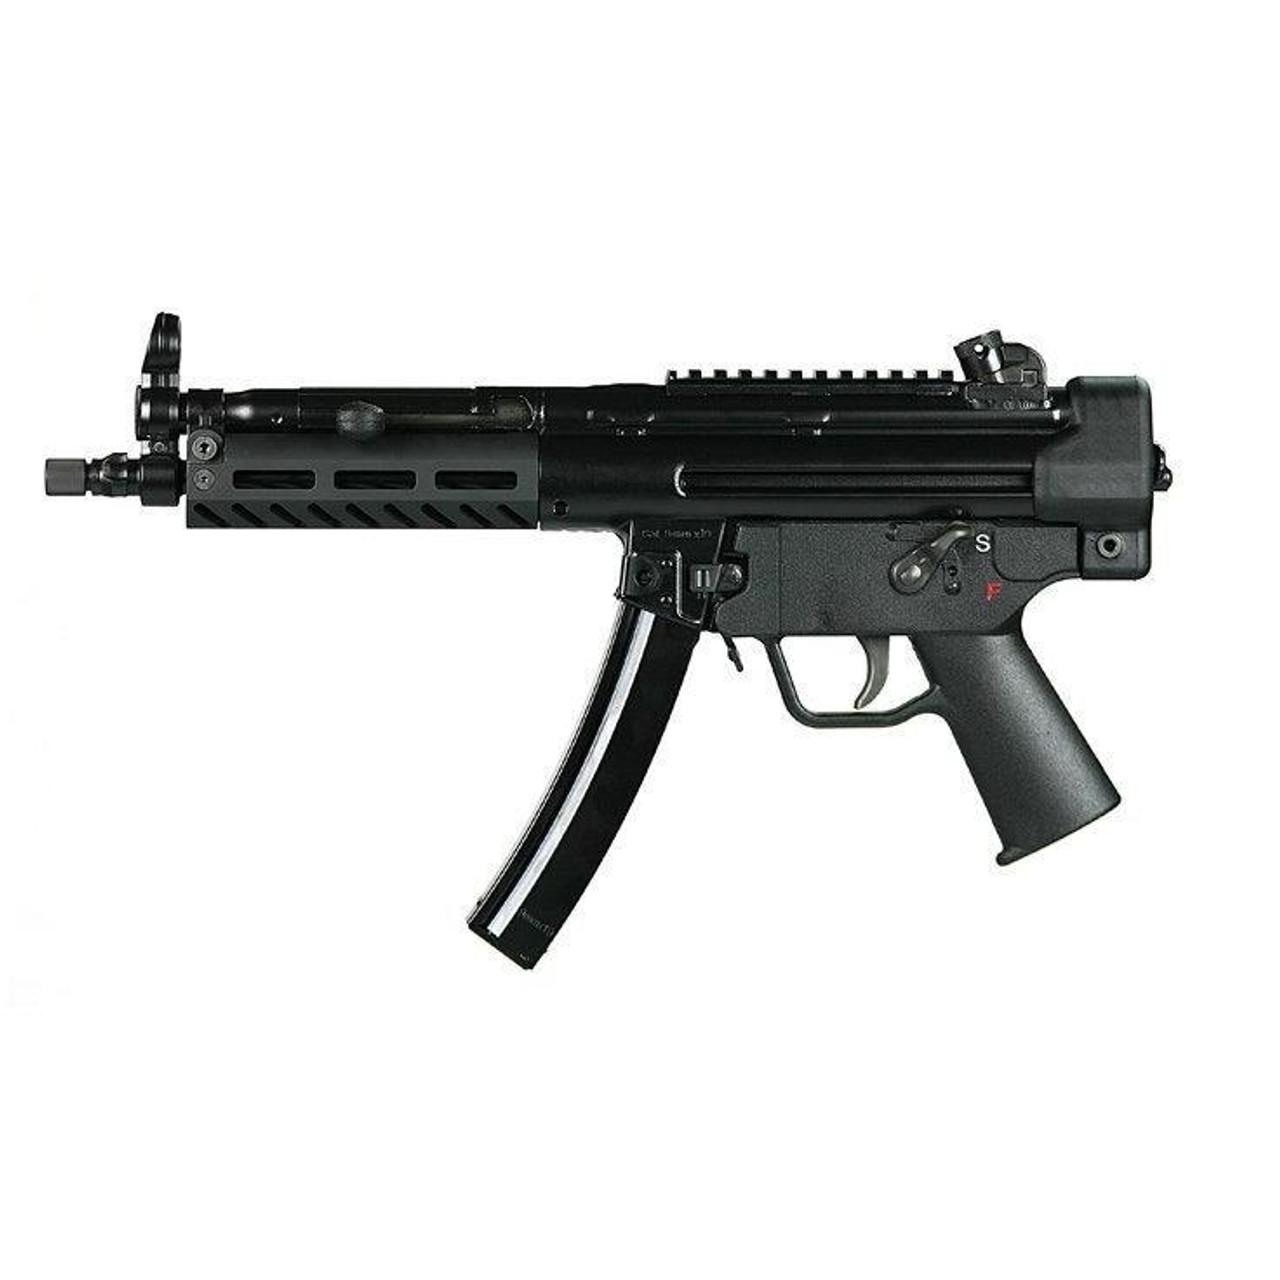 PTR 9CT pistol (9mm) 601 - HK MP5 clone